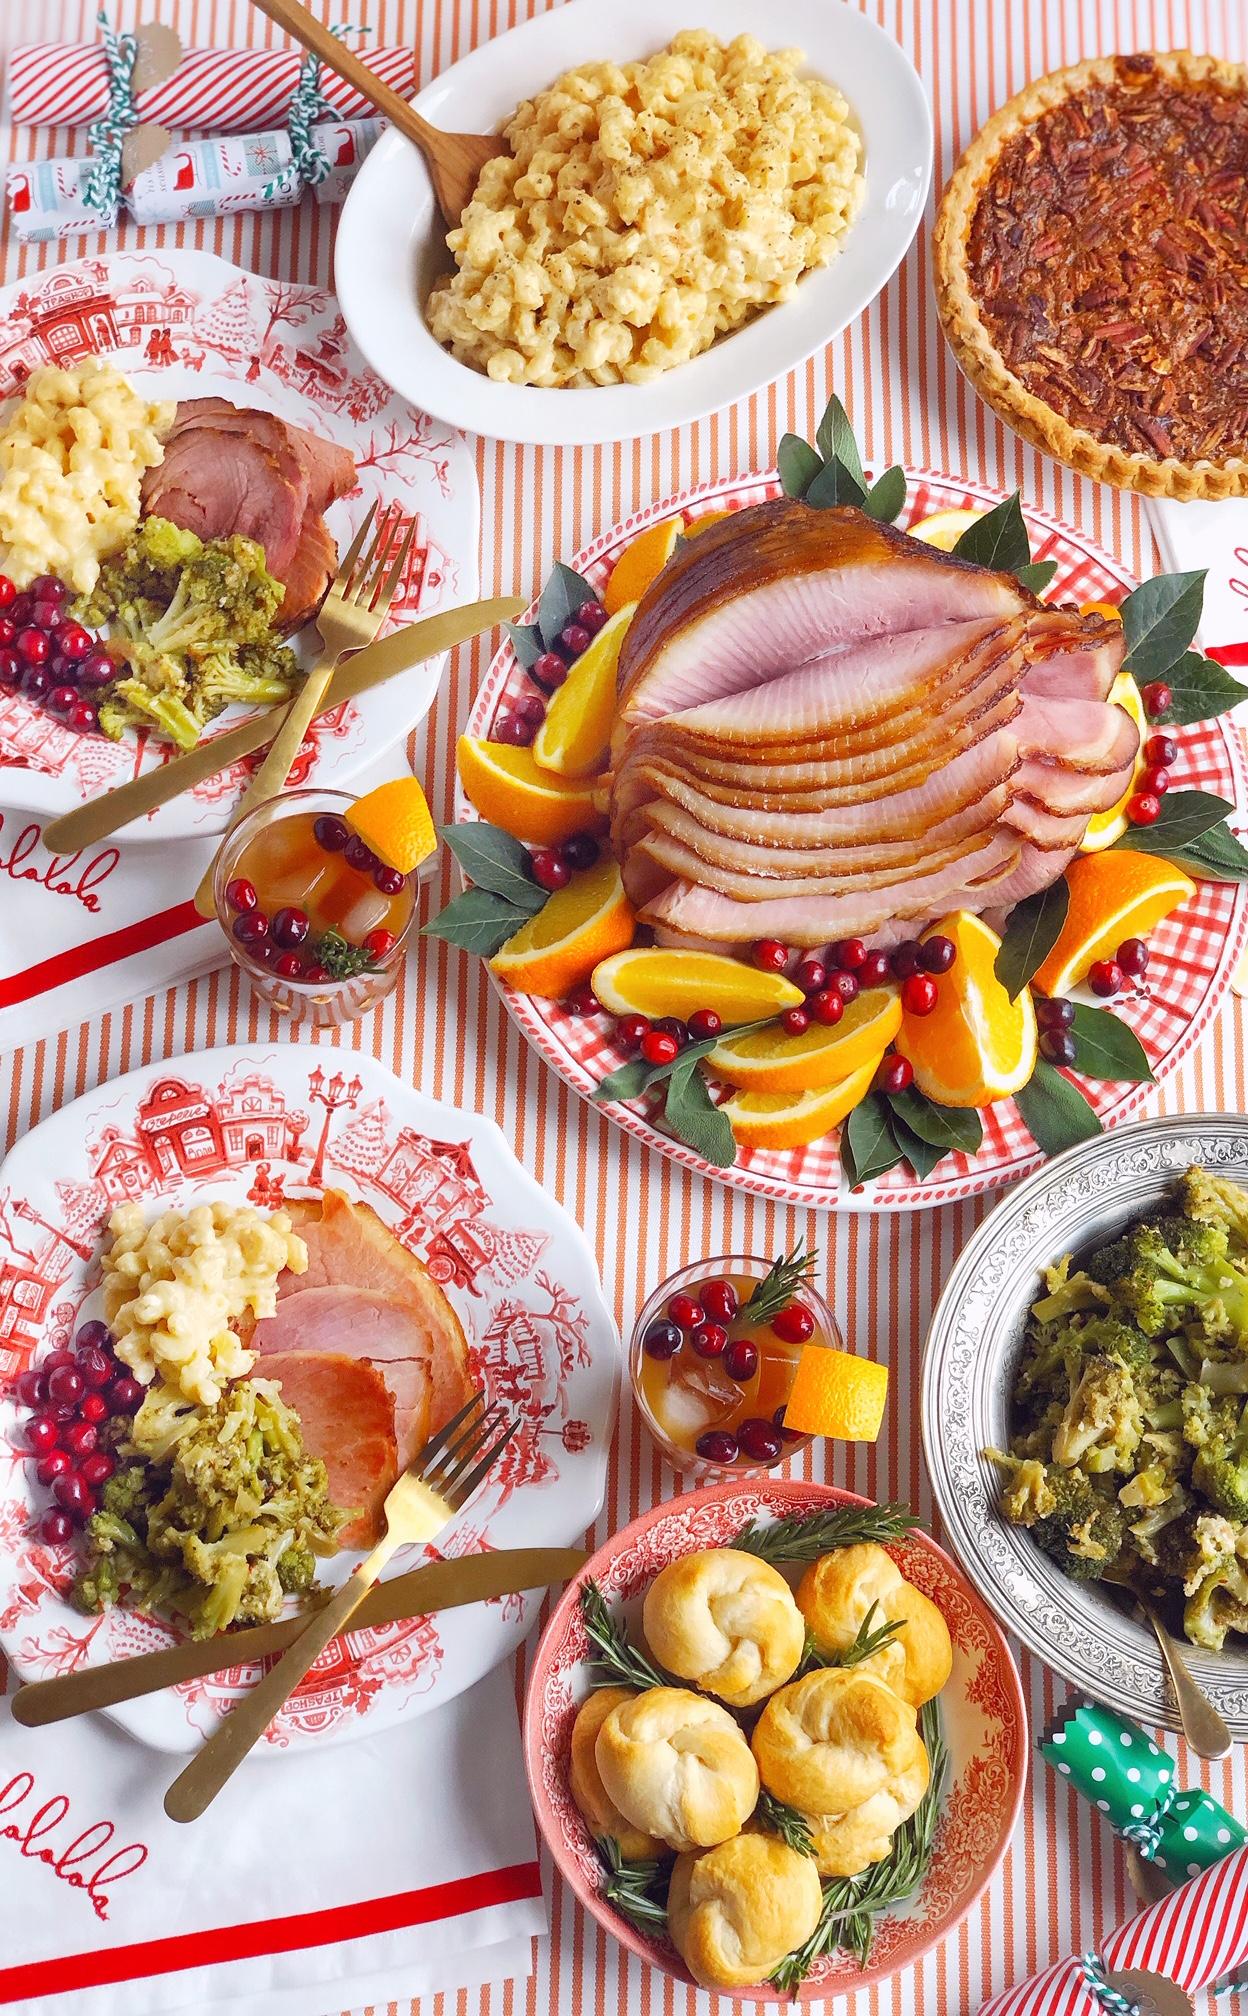 Honey Baked Ham Christmas Dinners For 2020 A Simple Christmas Dinner Menu.   DomestikatedLife